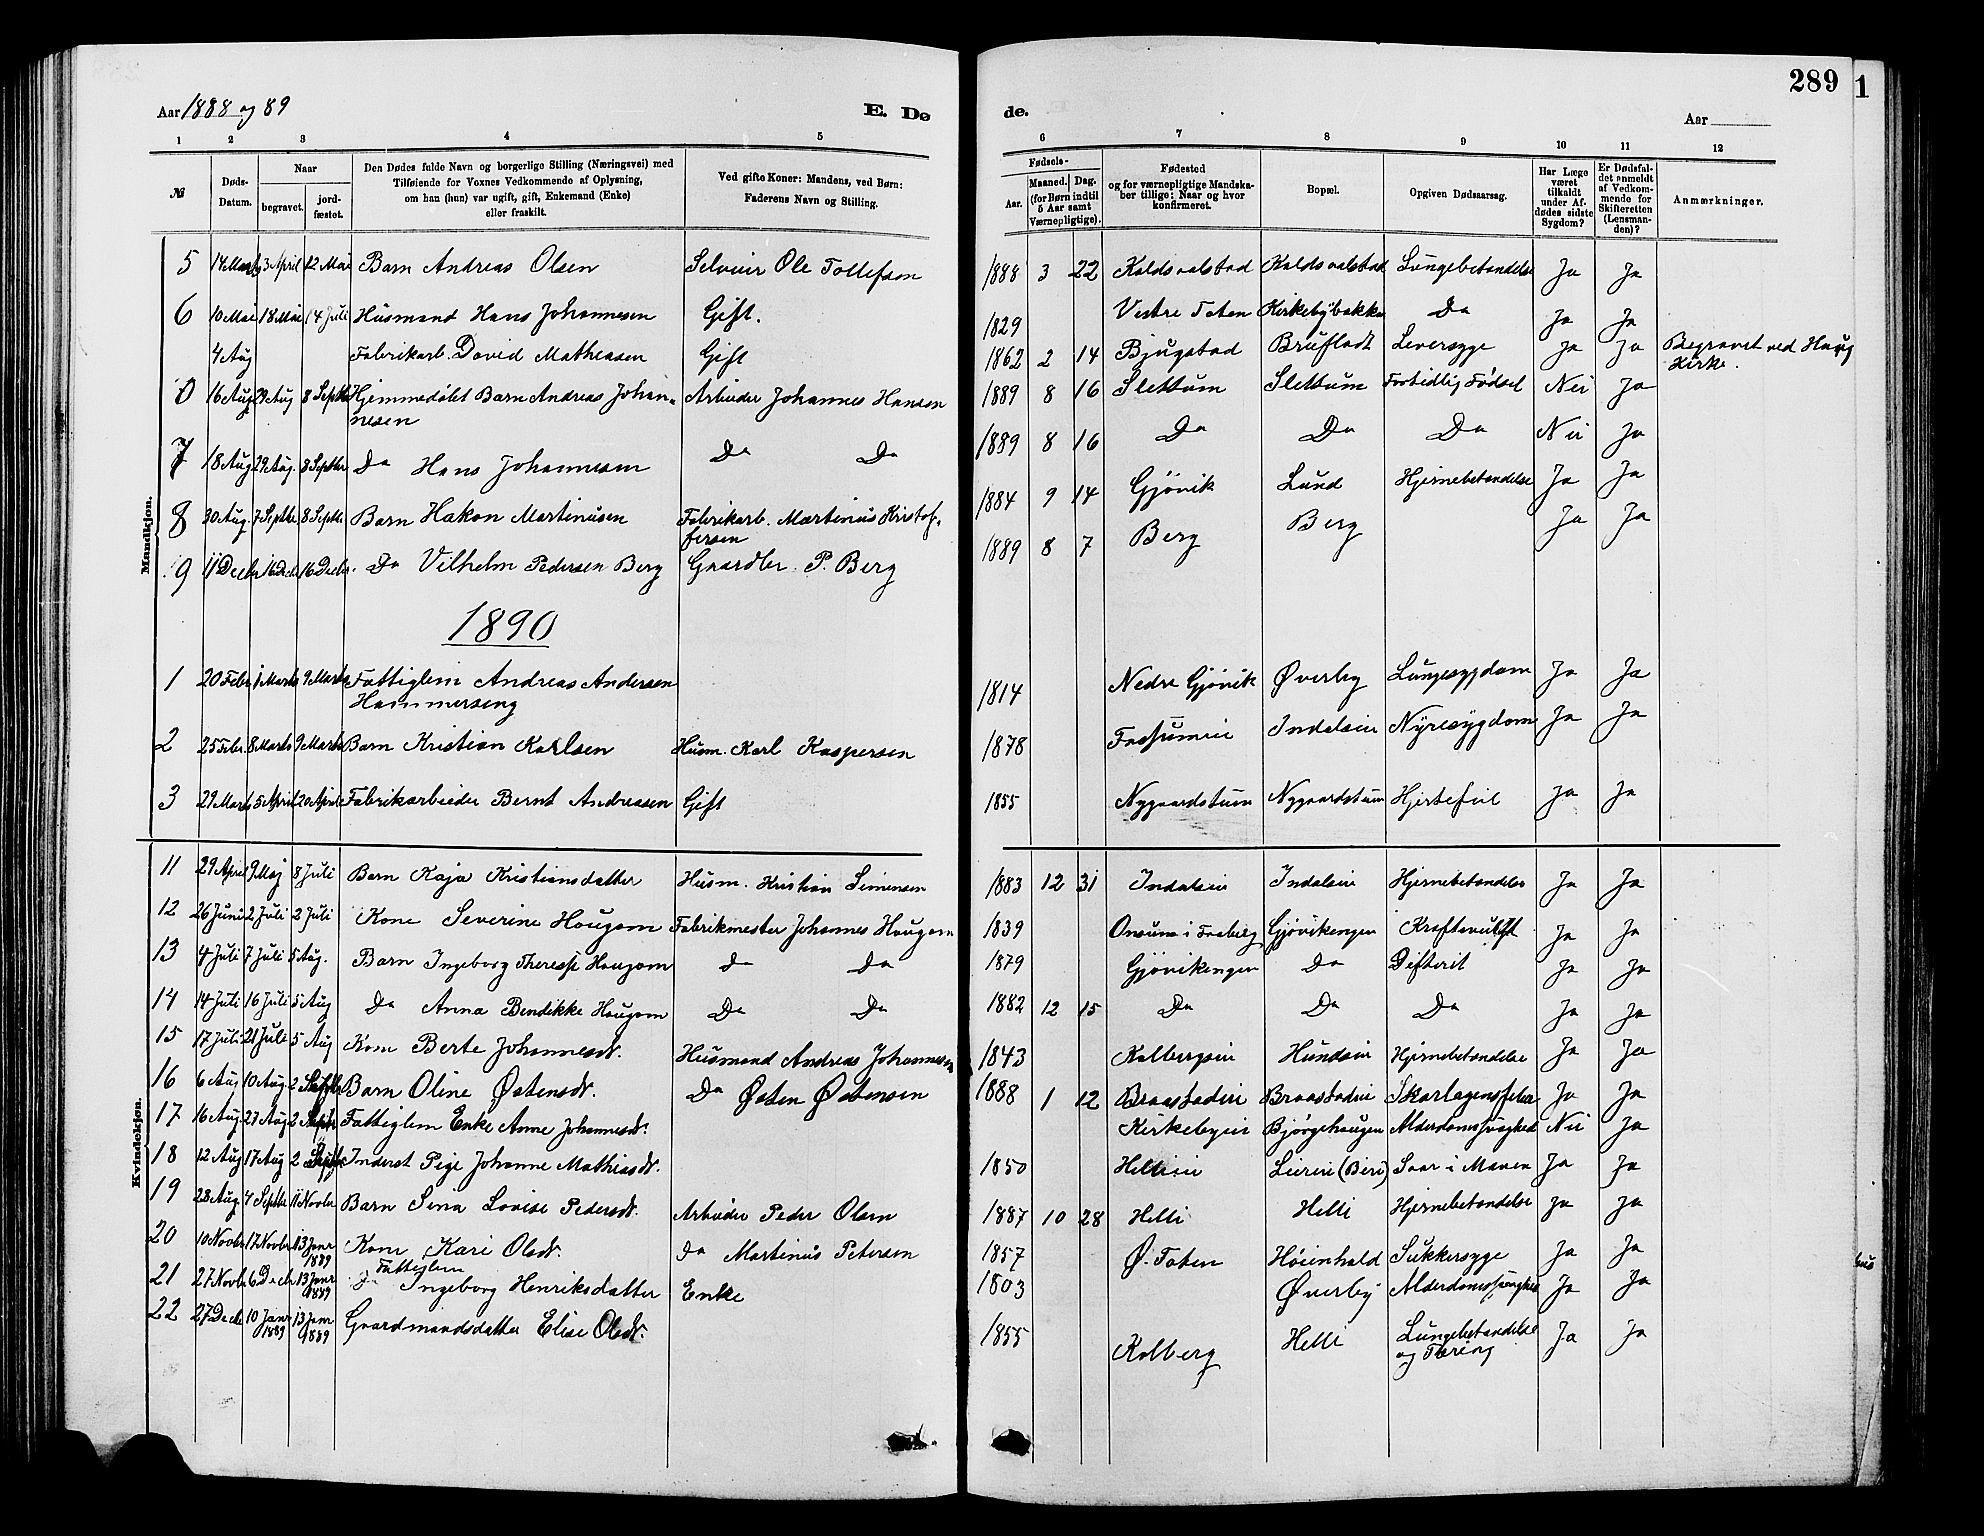 SAH, Vardal prestekontor, H/Ha/Hab/L0007: Klokkerbok nr. 7 /1, 1881-1895, s. 289